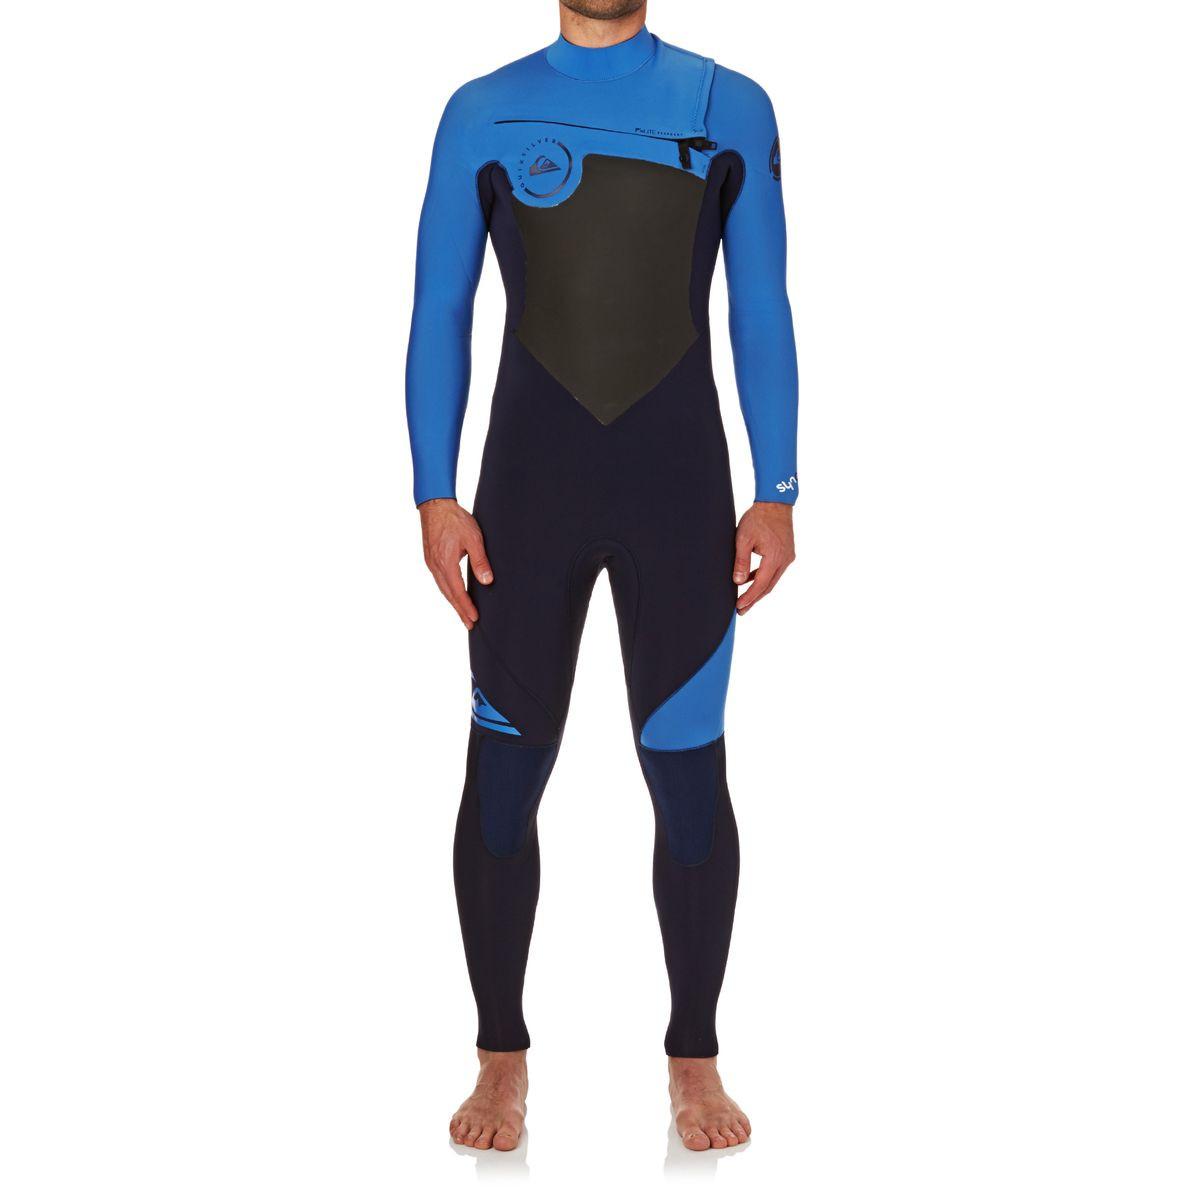 Quiksilver Syncro 4/3mm 2017 Chest Zip Wetsuit - Navy Blazer